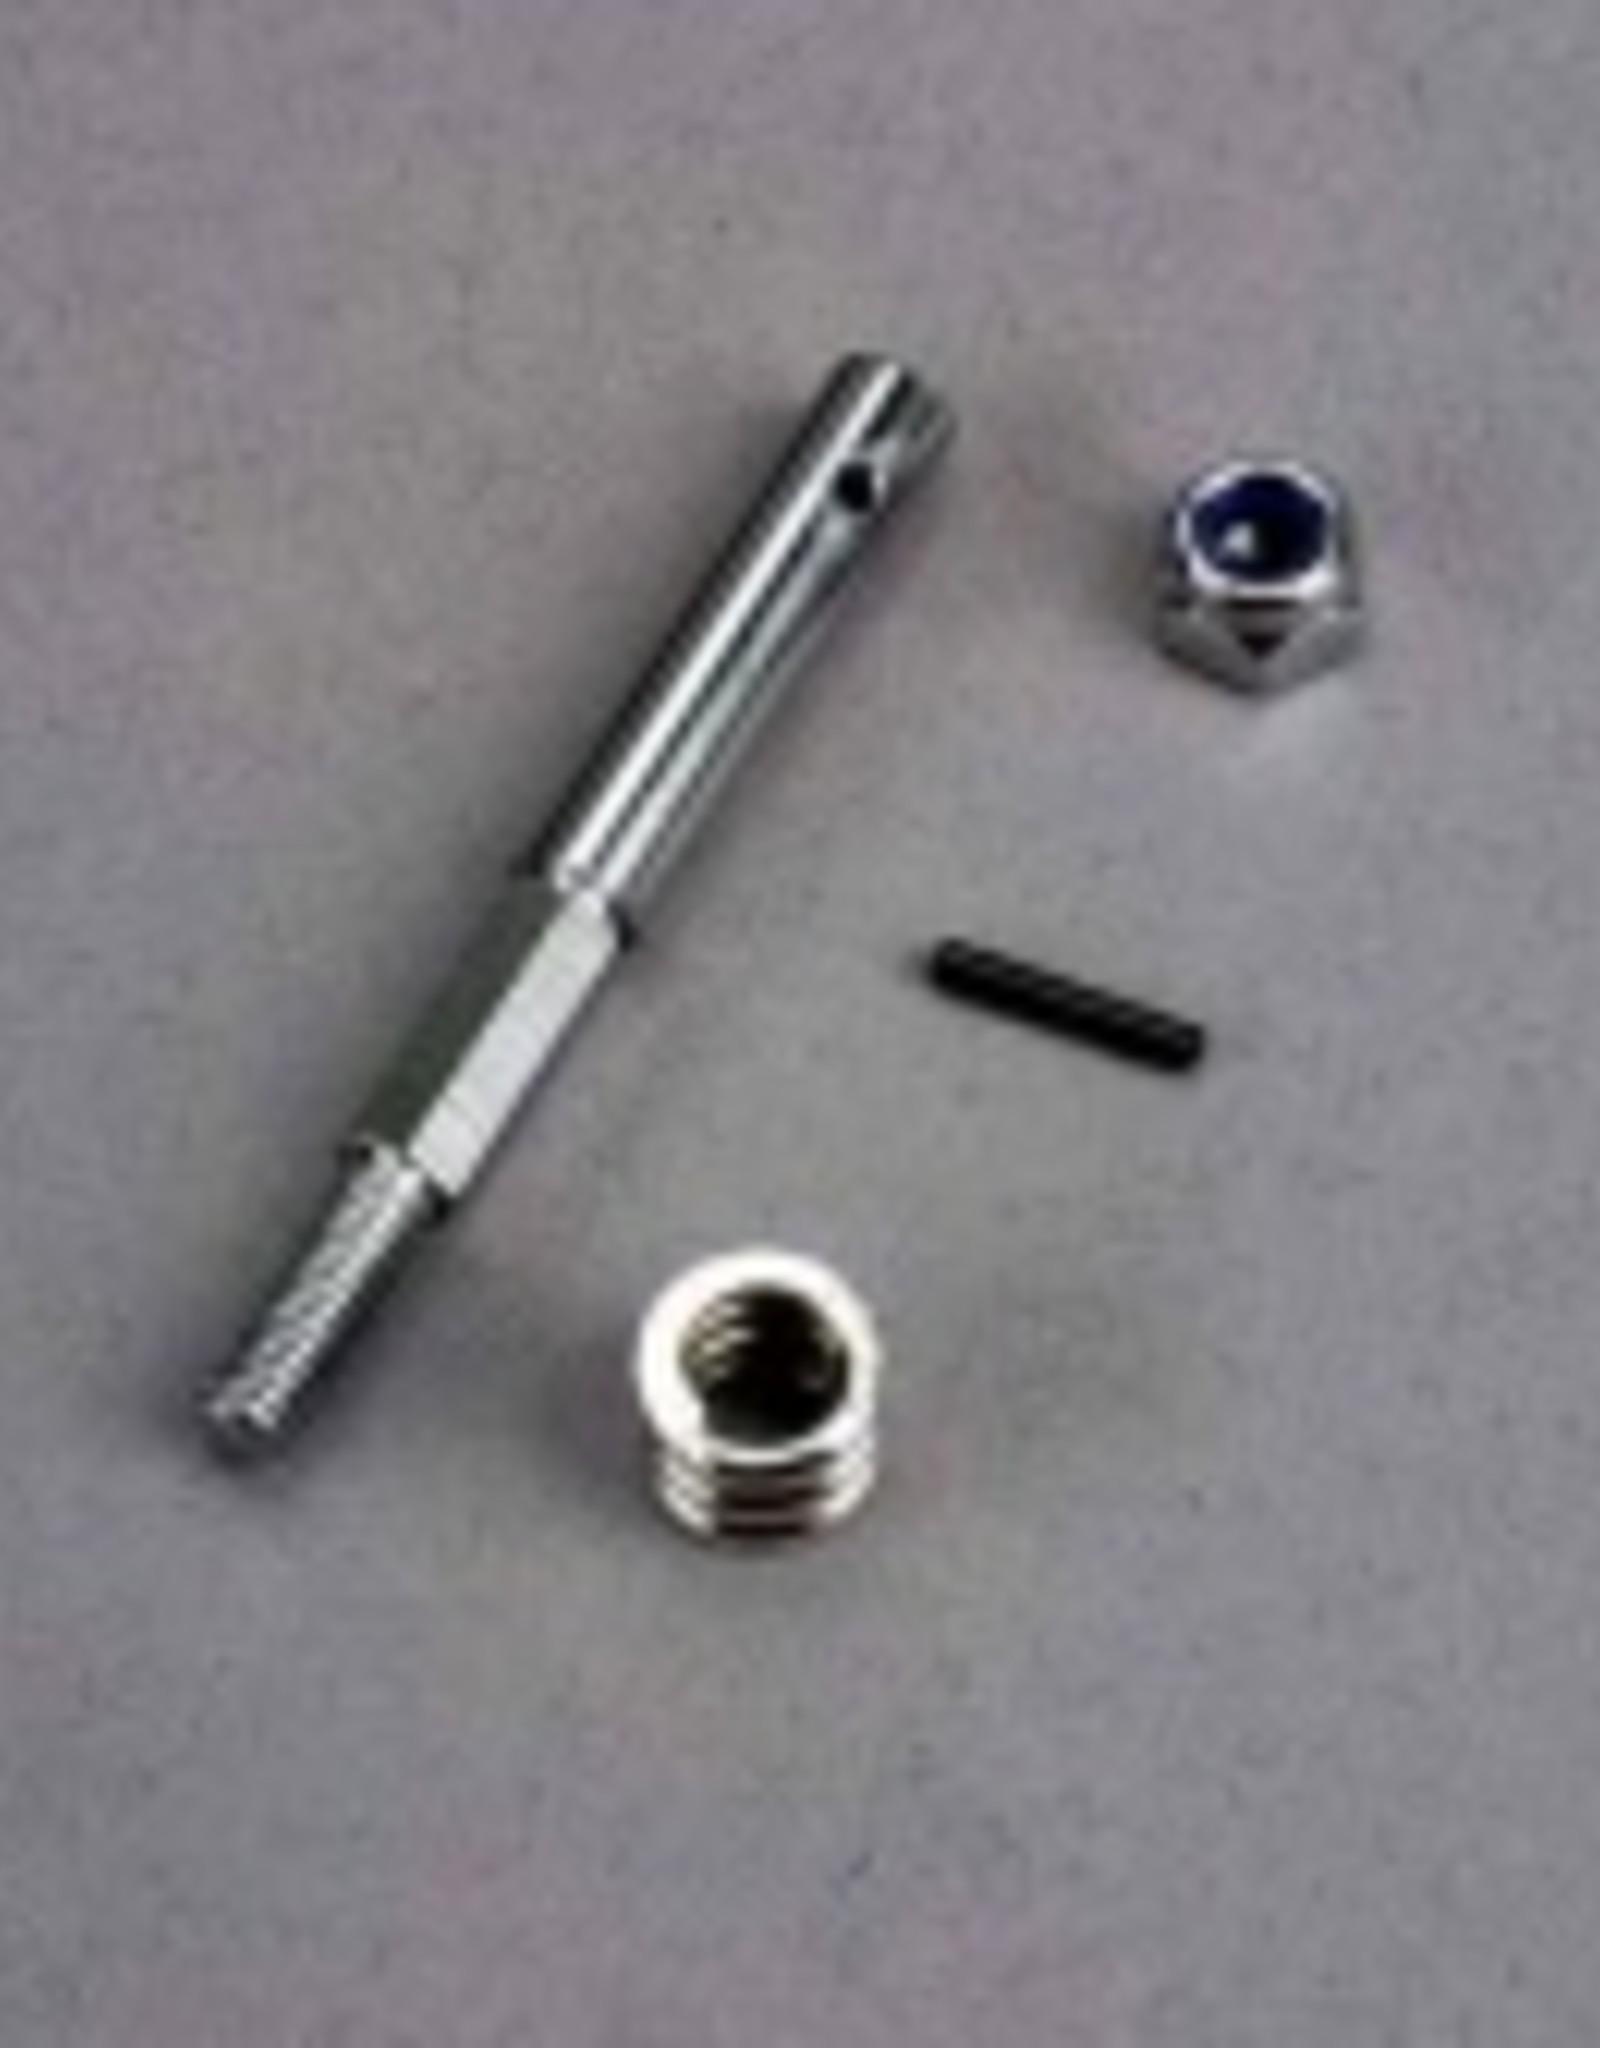 Traxxas Shaft, slipper clutch (w/ roll pin)